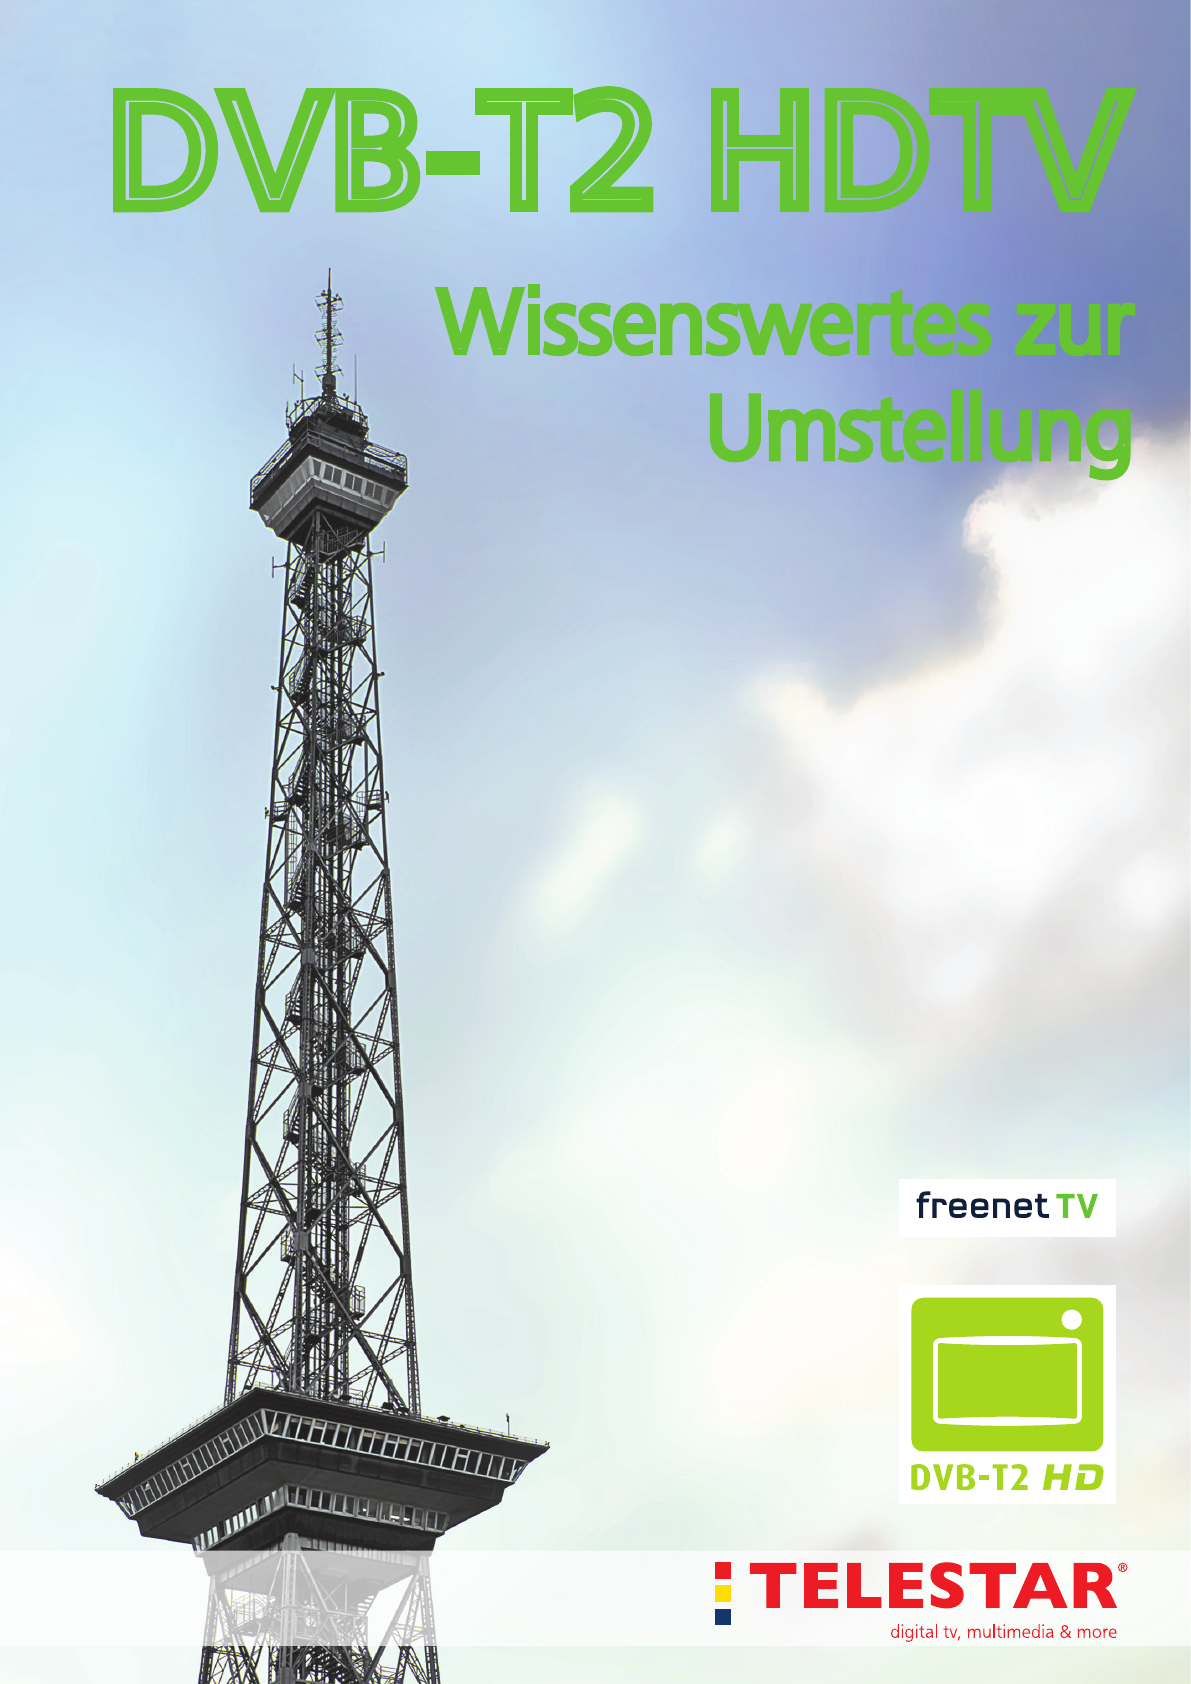 Bedienungsanleitung Telestar DVB-T2 - freenet TV (Seite 1